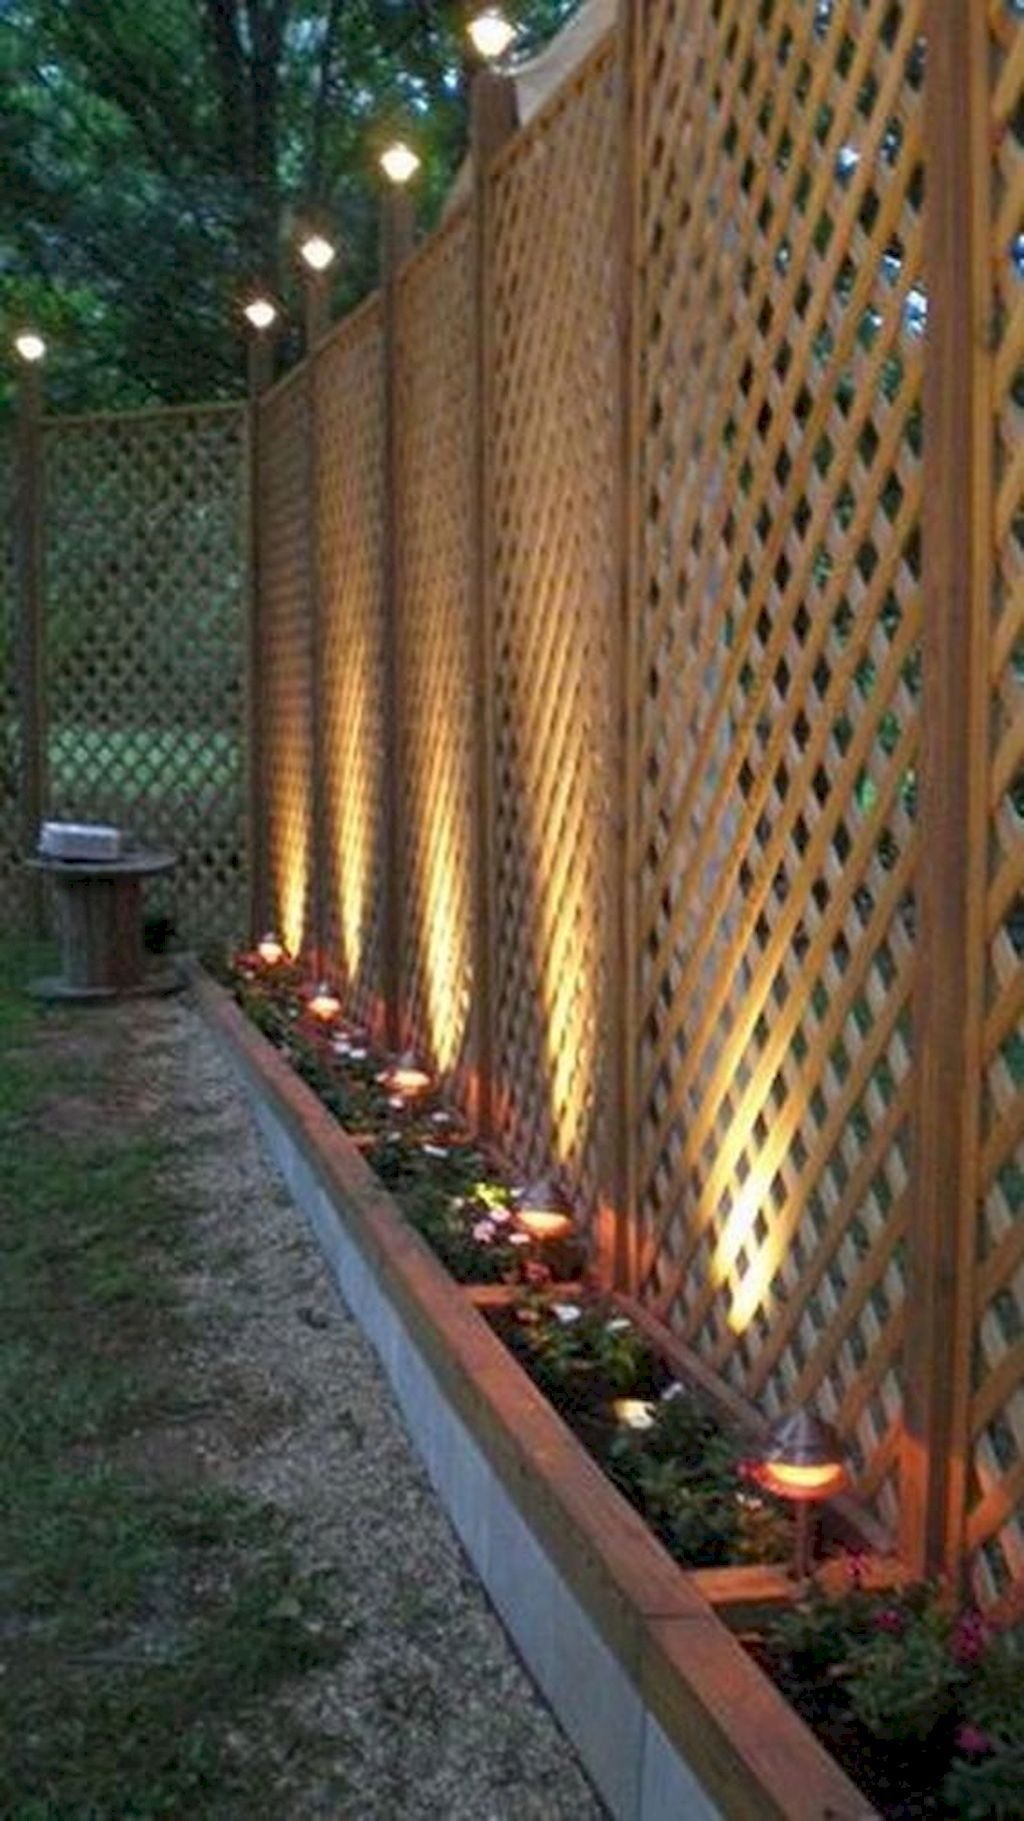 85 Marvelous Backyard Privacy Fence Decor Ideas on A ... on Backyard Wooden Fence Decorating Ideas id=56727